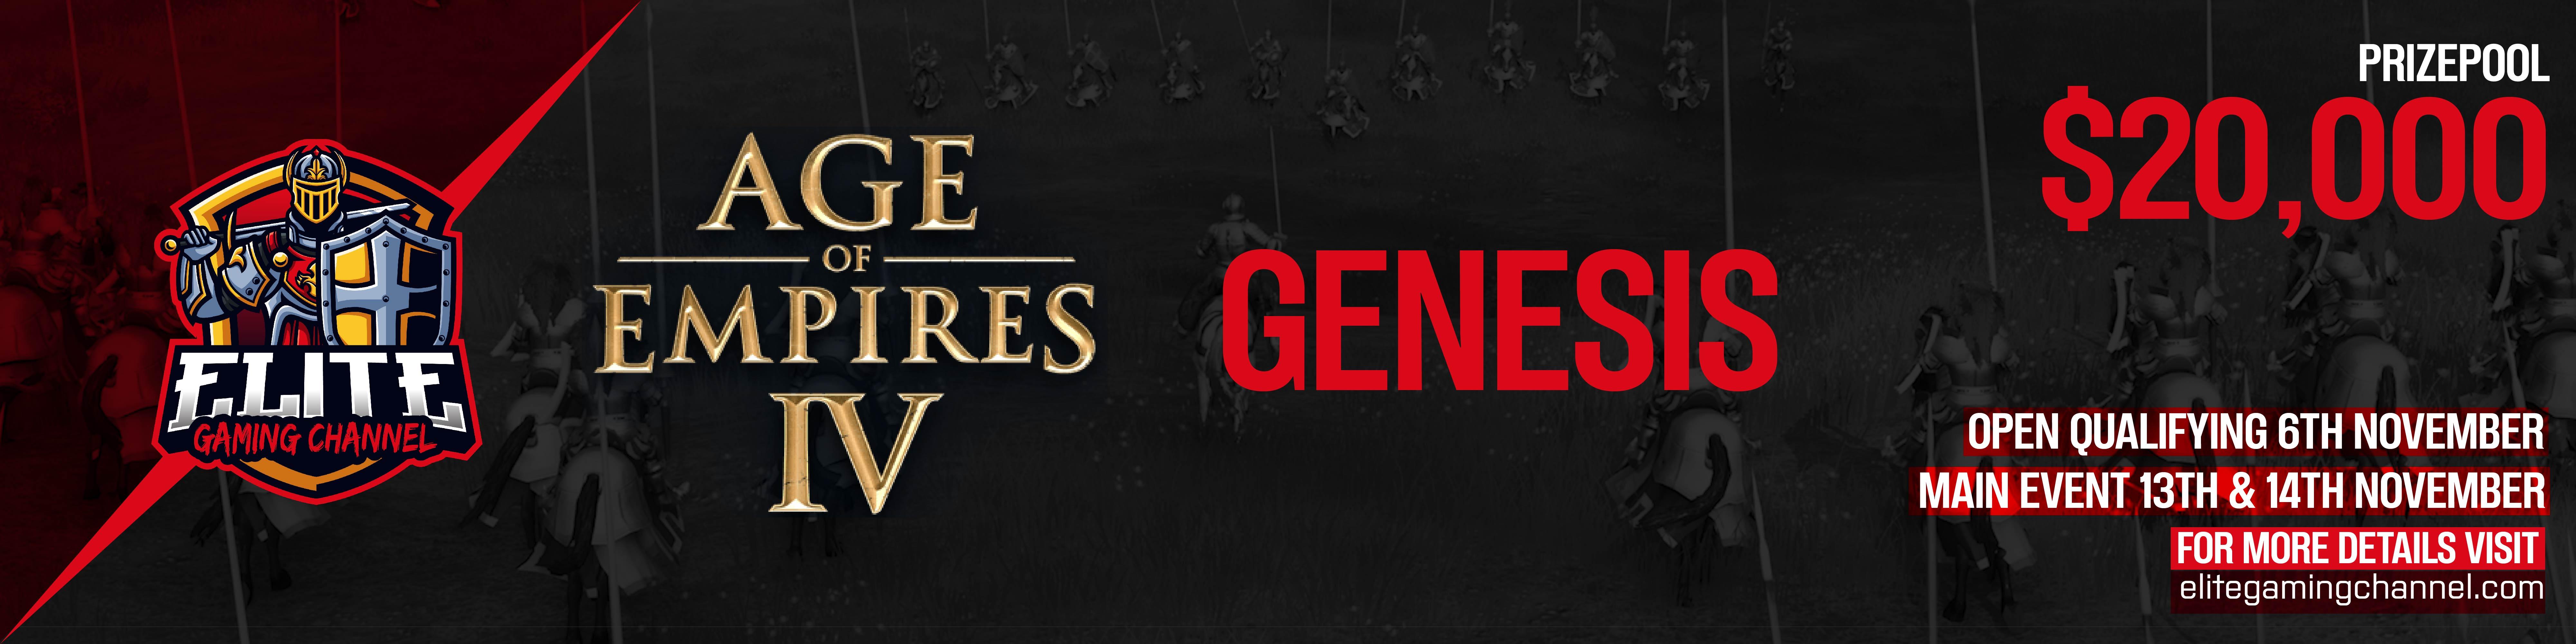 Genesis-banner-small.jpg